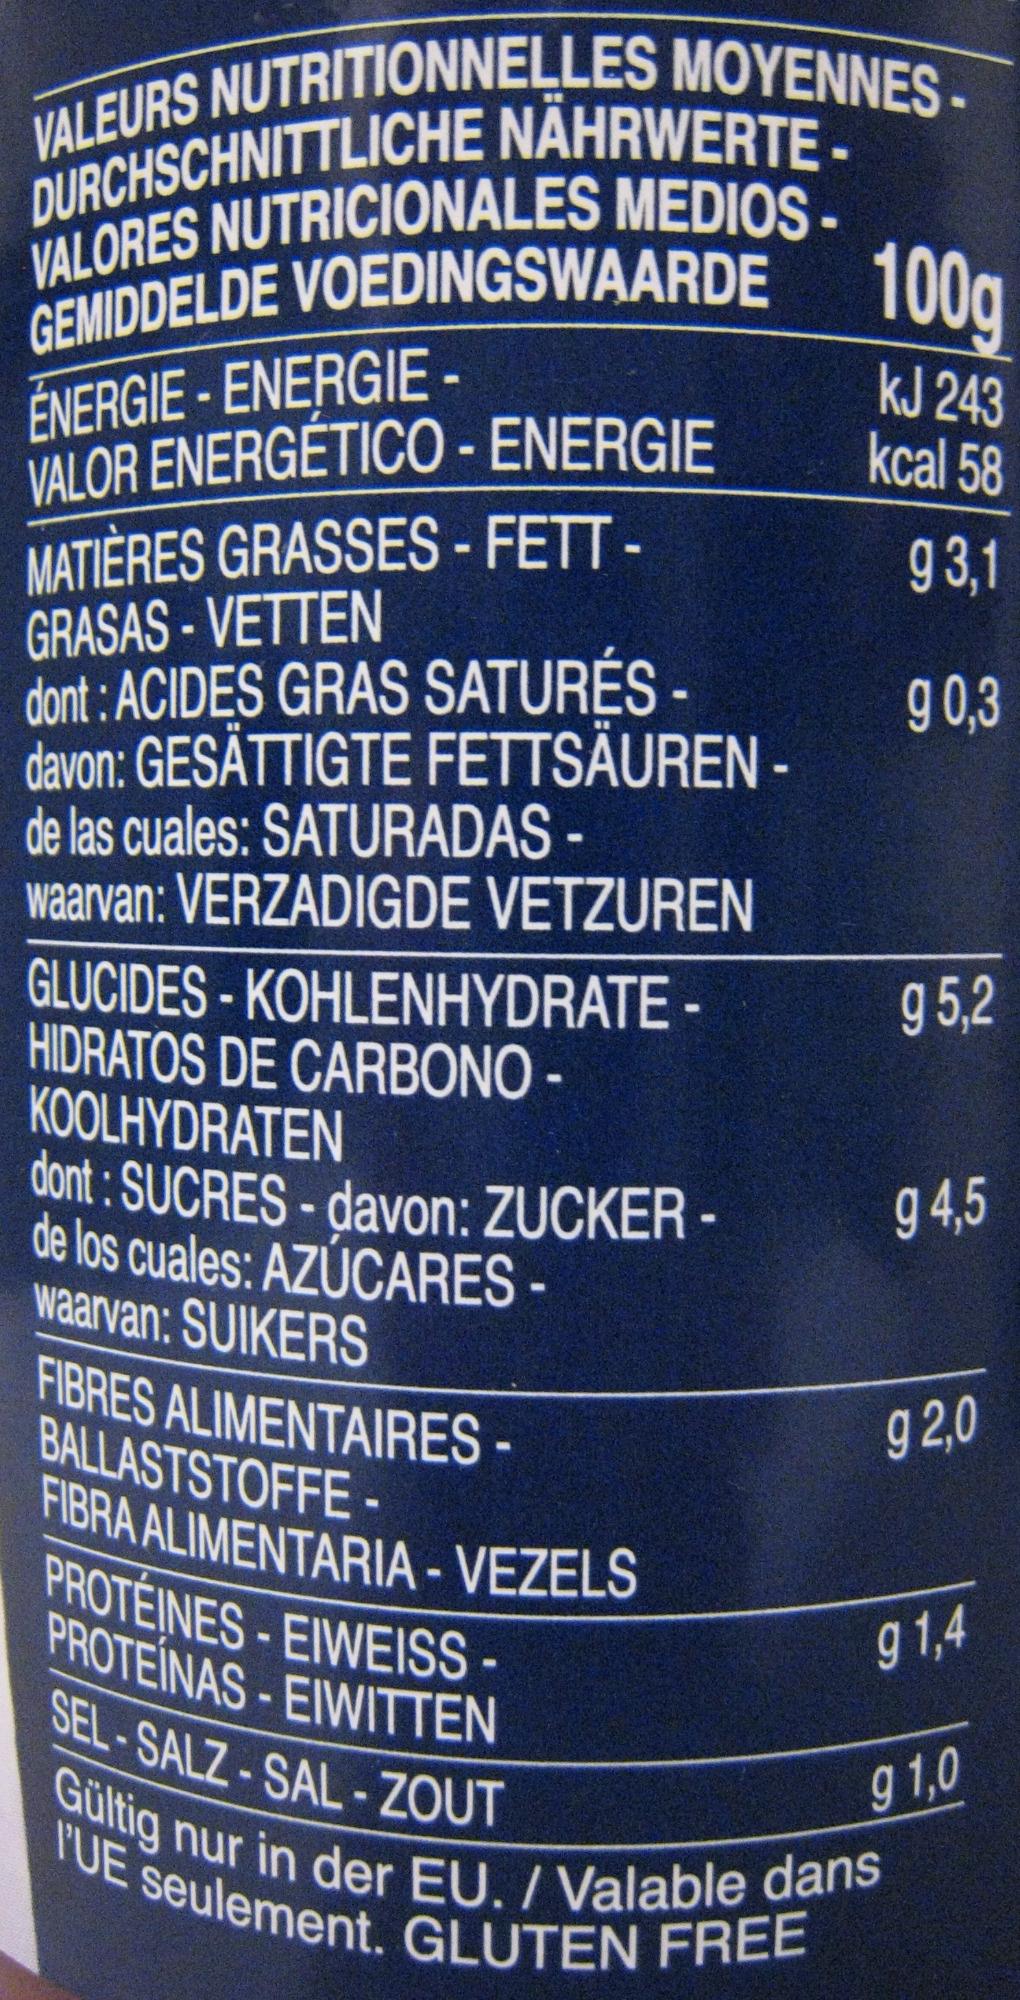 Sauce arrabbiata - Valori nutrizionali - fr